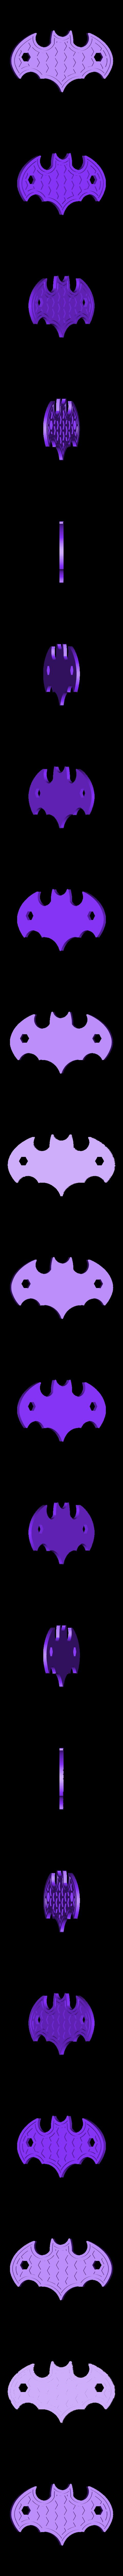 Bat_Barette.stl Download free STL file Bat Barrette • 3D printer object, Palmiga